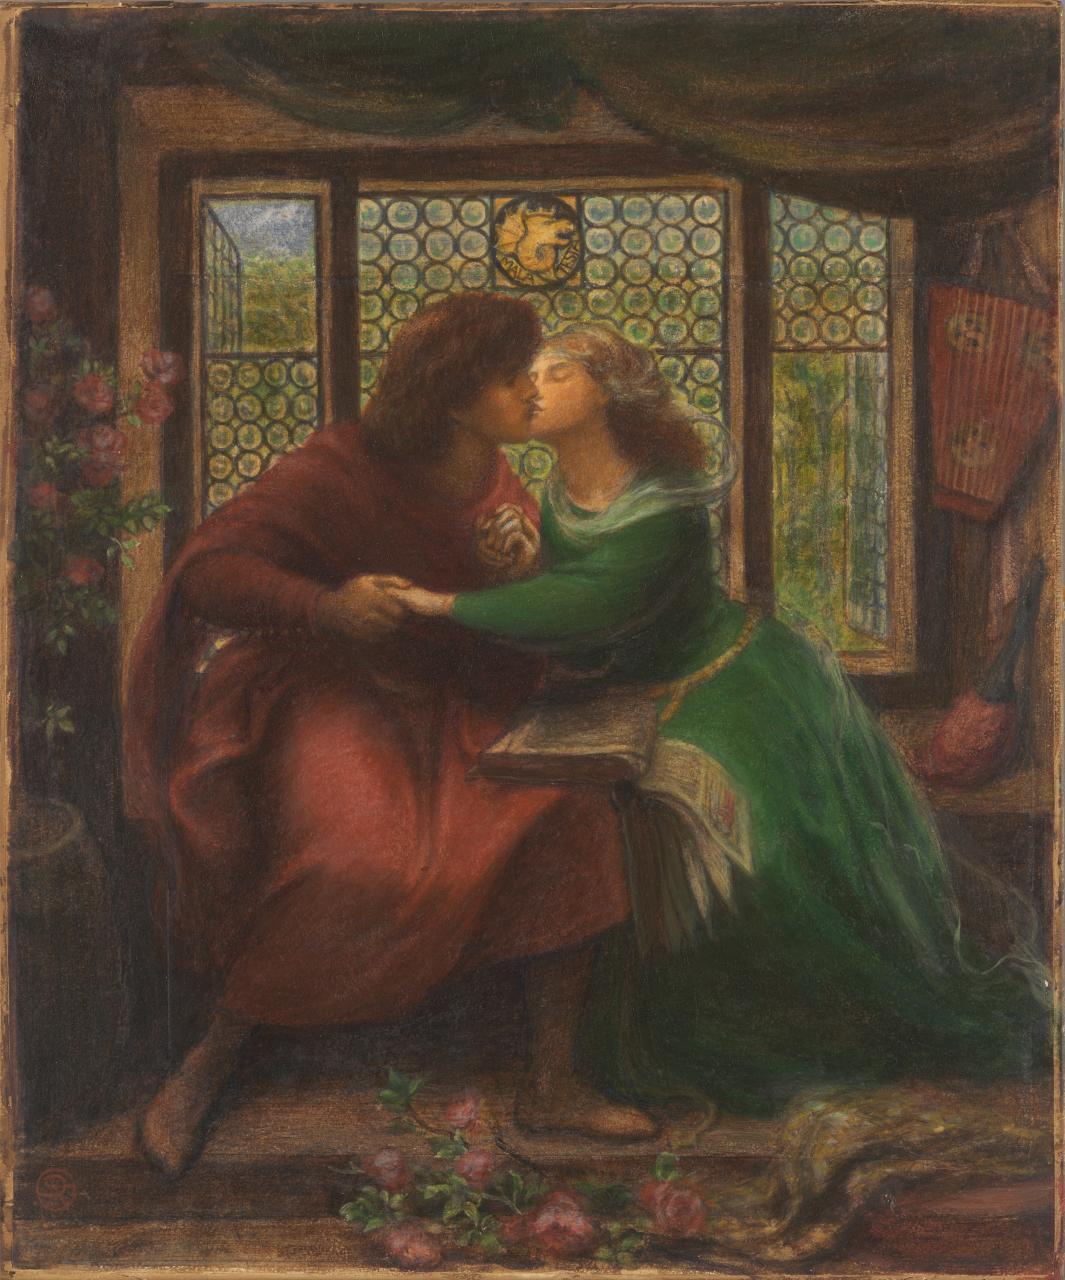 Image of painting by Dante Gabriel Rossetti Paolo and Francesco da Rimini